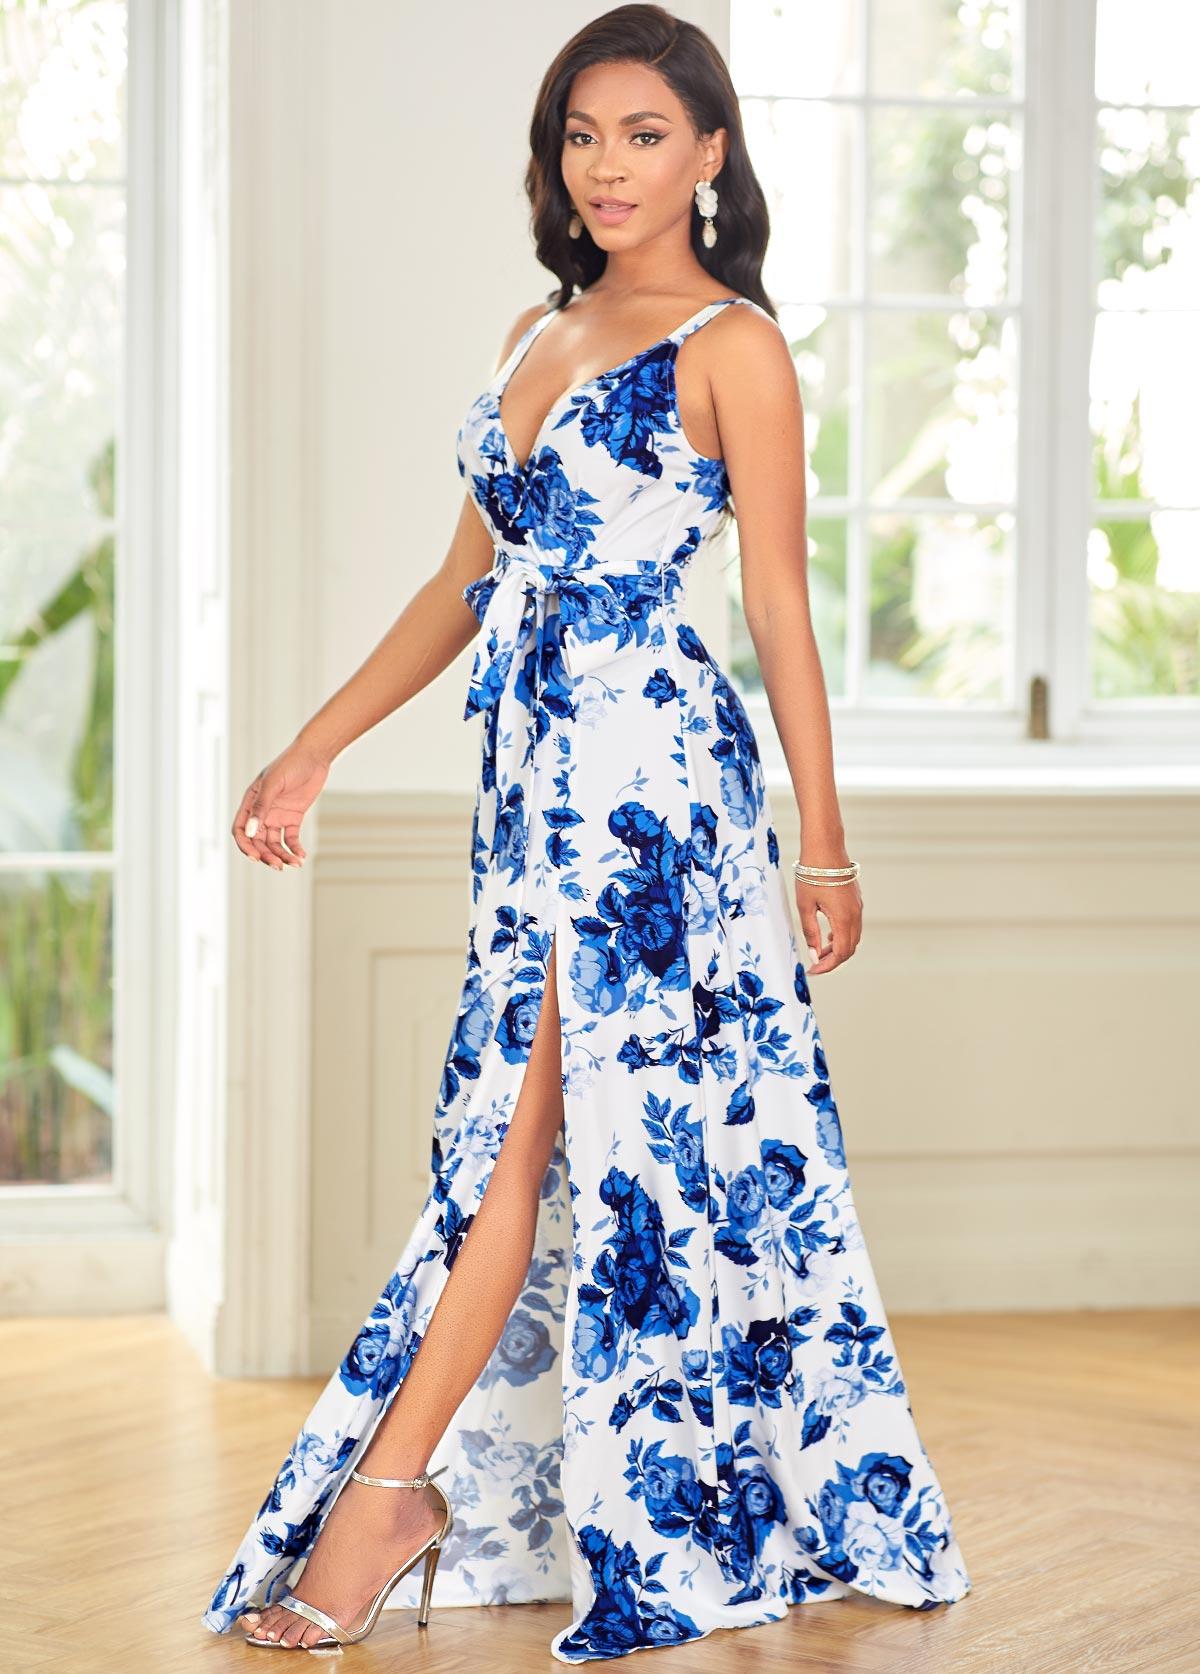 High Slit Spaghetti Strap Floral Print Dress